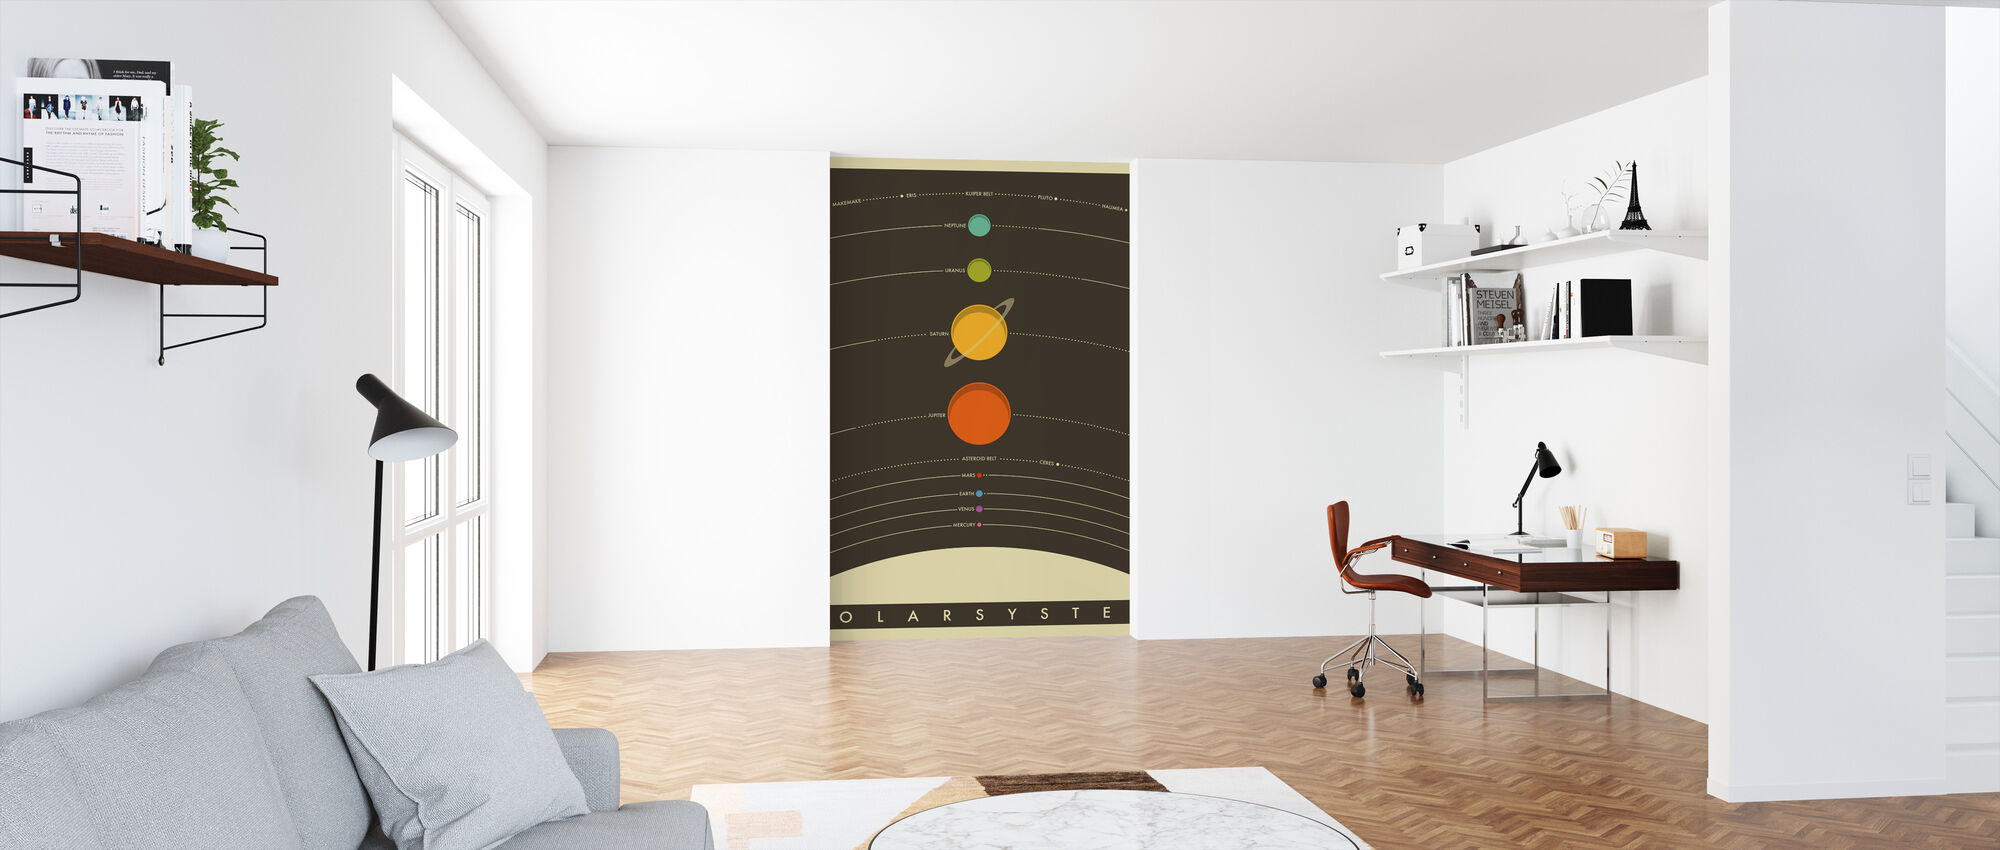 Solar System - Brown - Wallpaper - Office